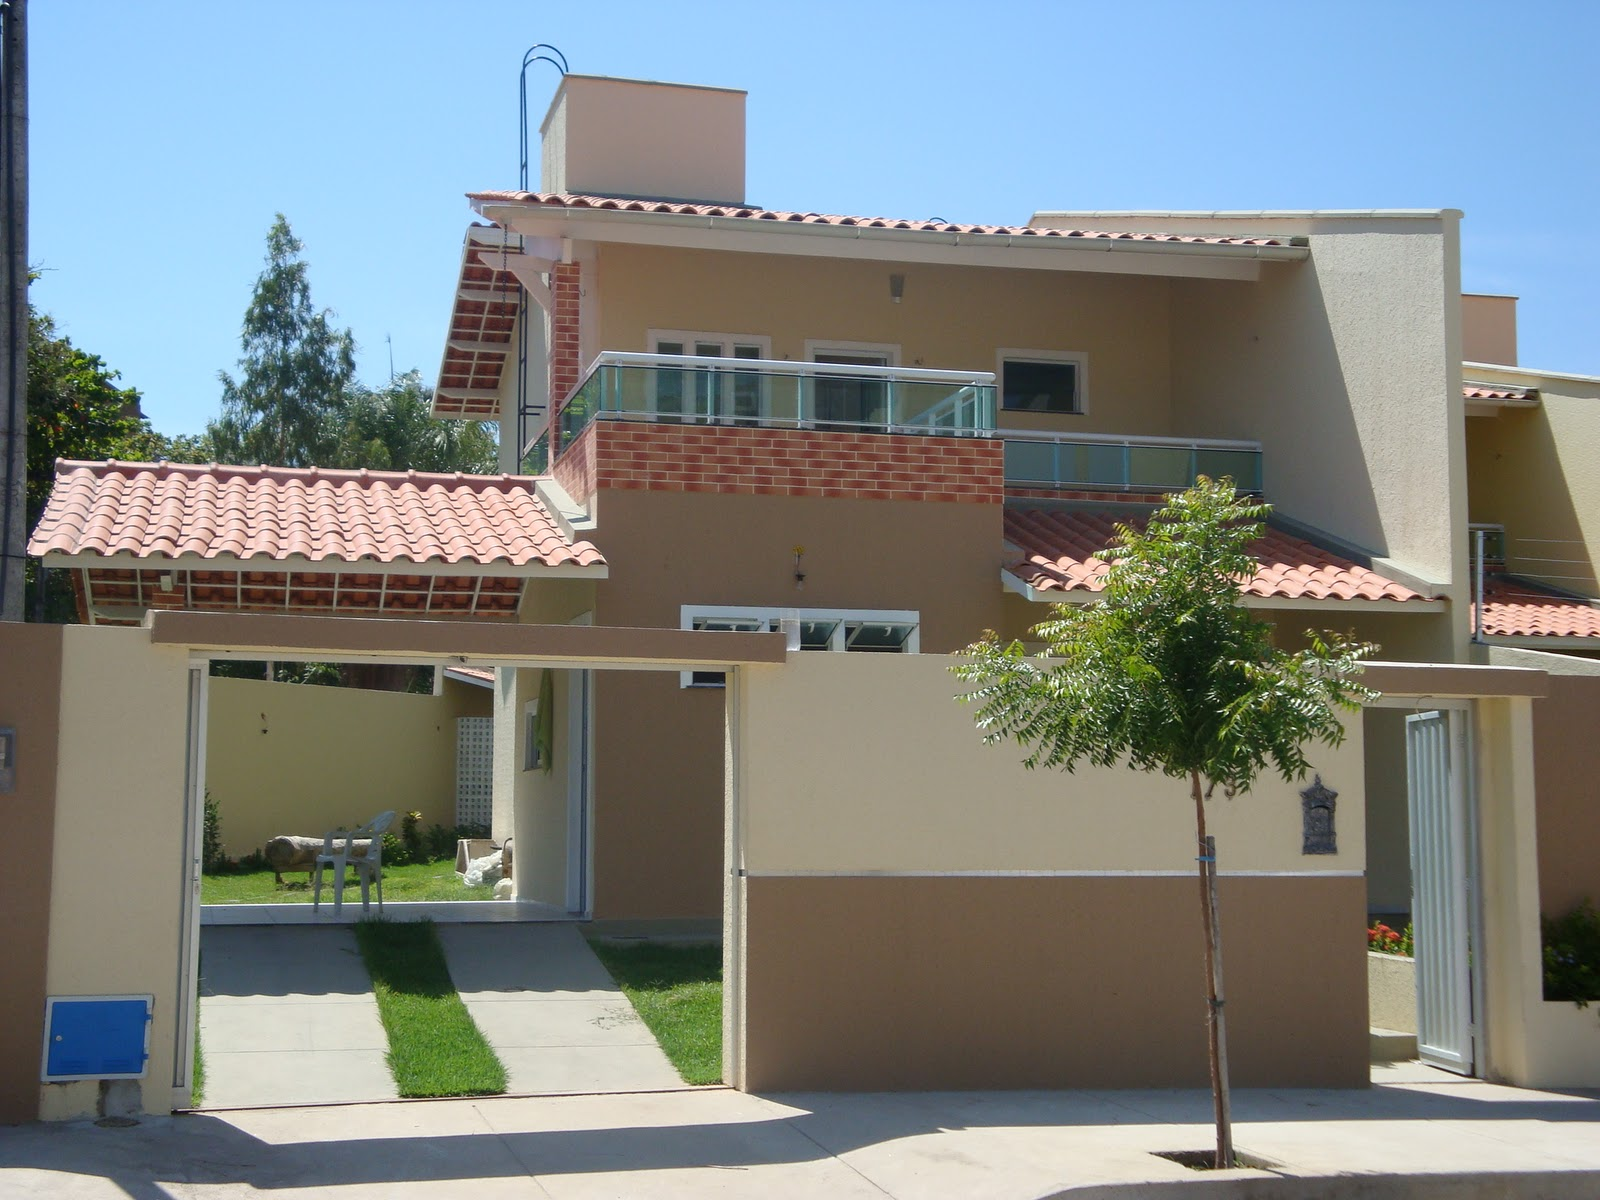 Tales santos consultoria imobili ria excelente casa for Fachadas de casas modernas 1 pavimento